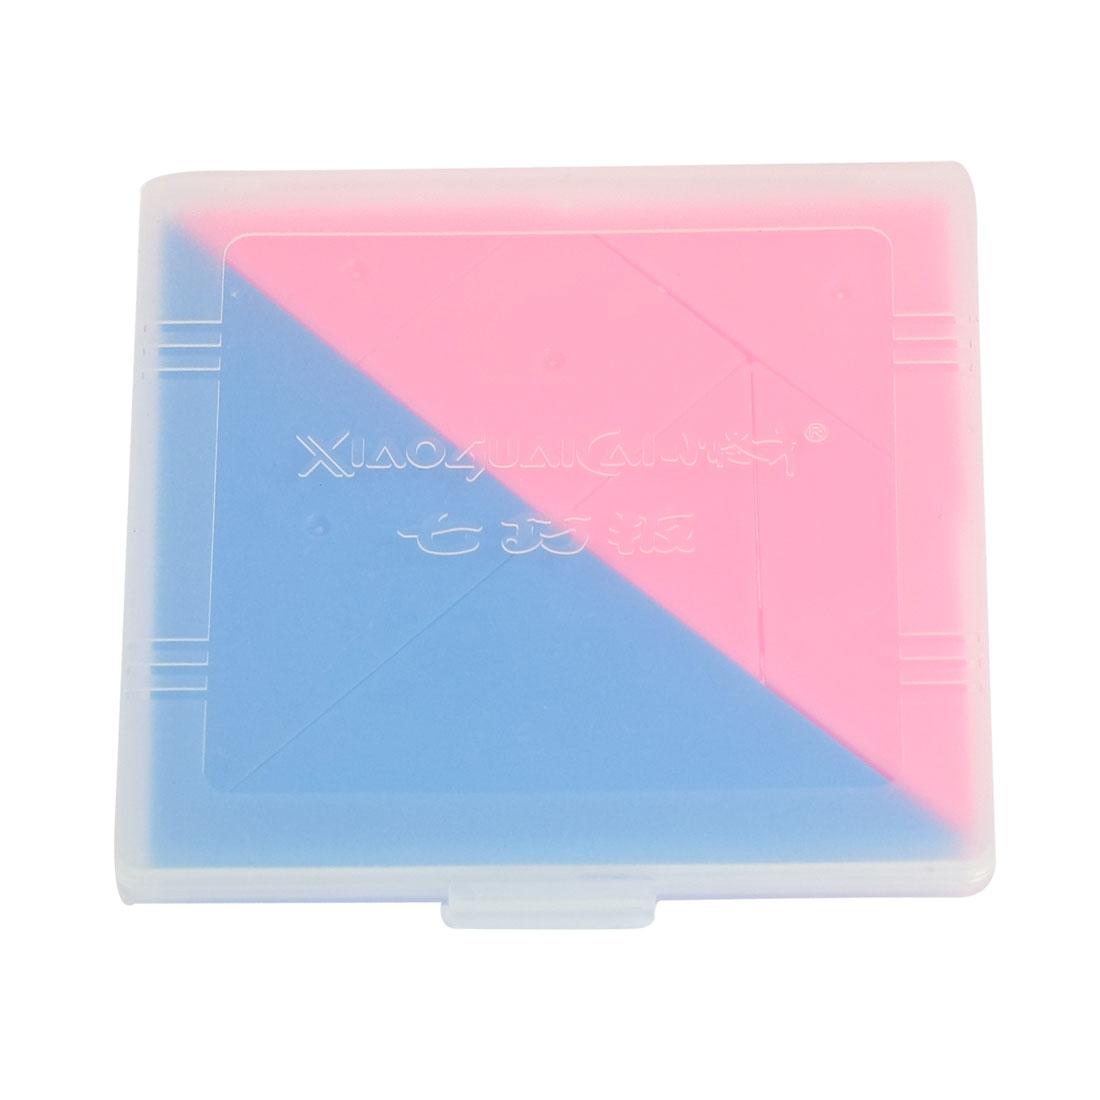 Brain Train Plastic 7 Parts Geometry Puzzle Toy Pink Blue